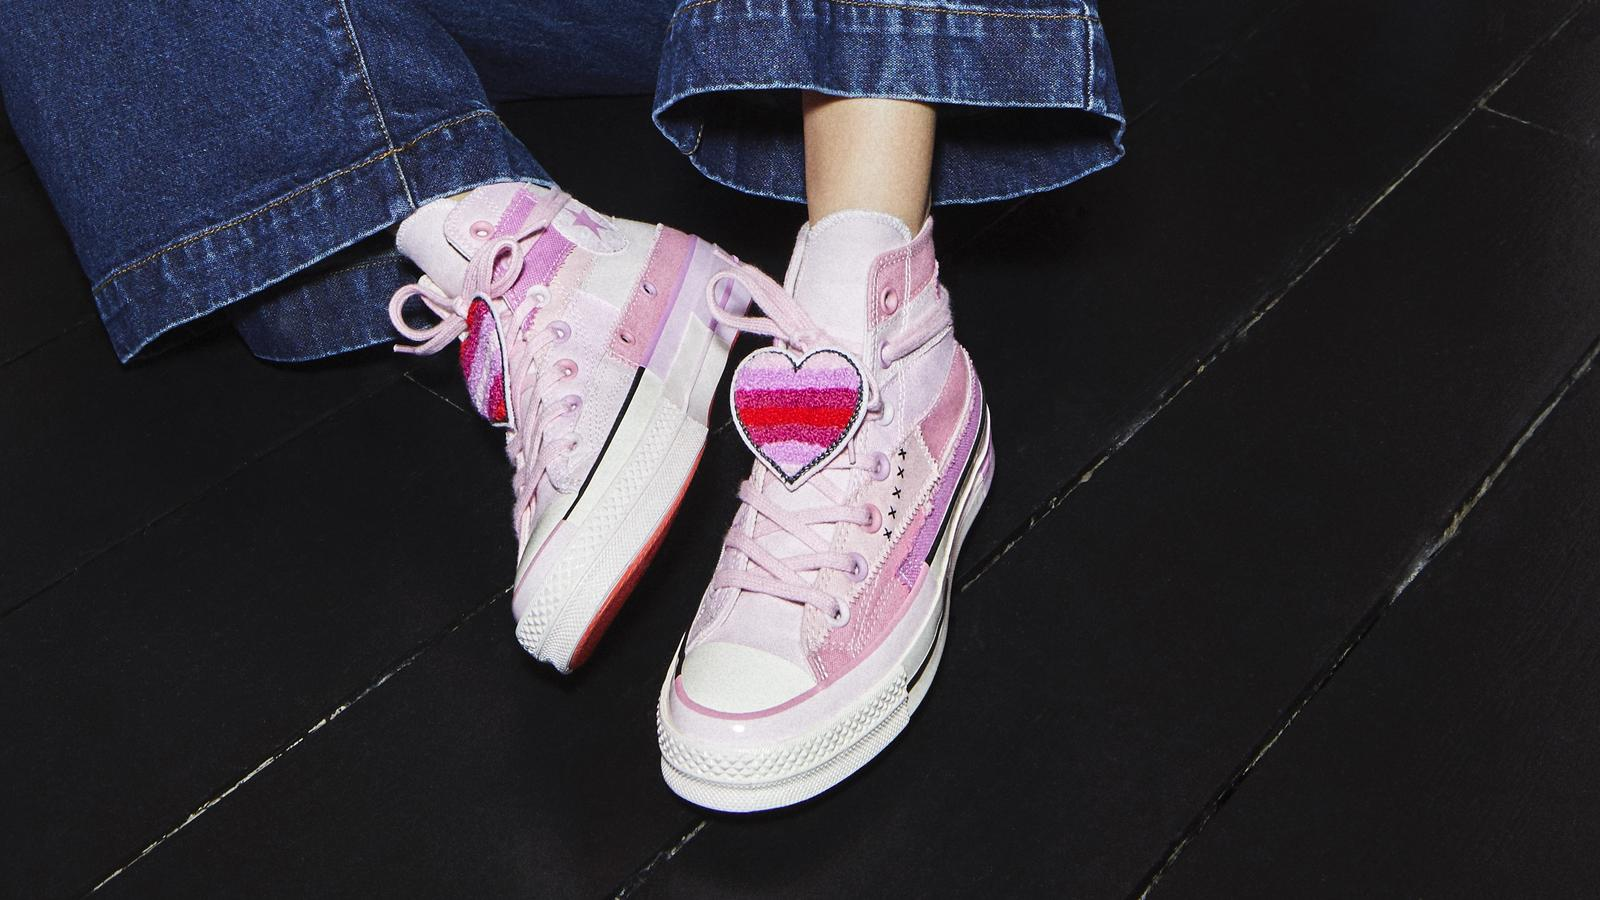 Converse x Millie Bobby Brown Chuck